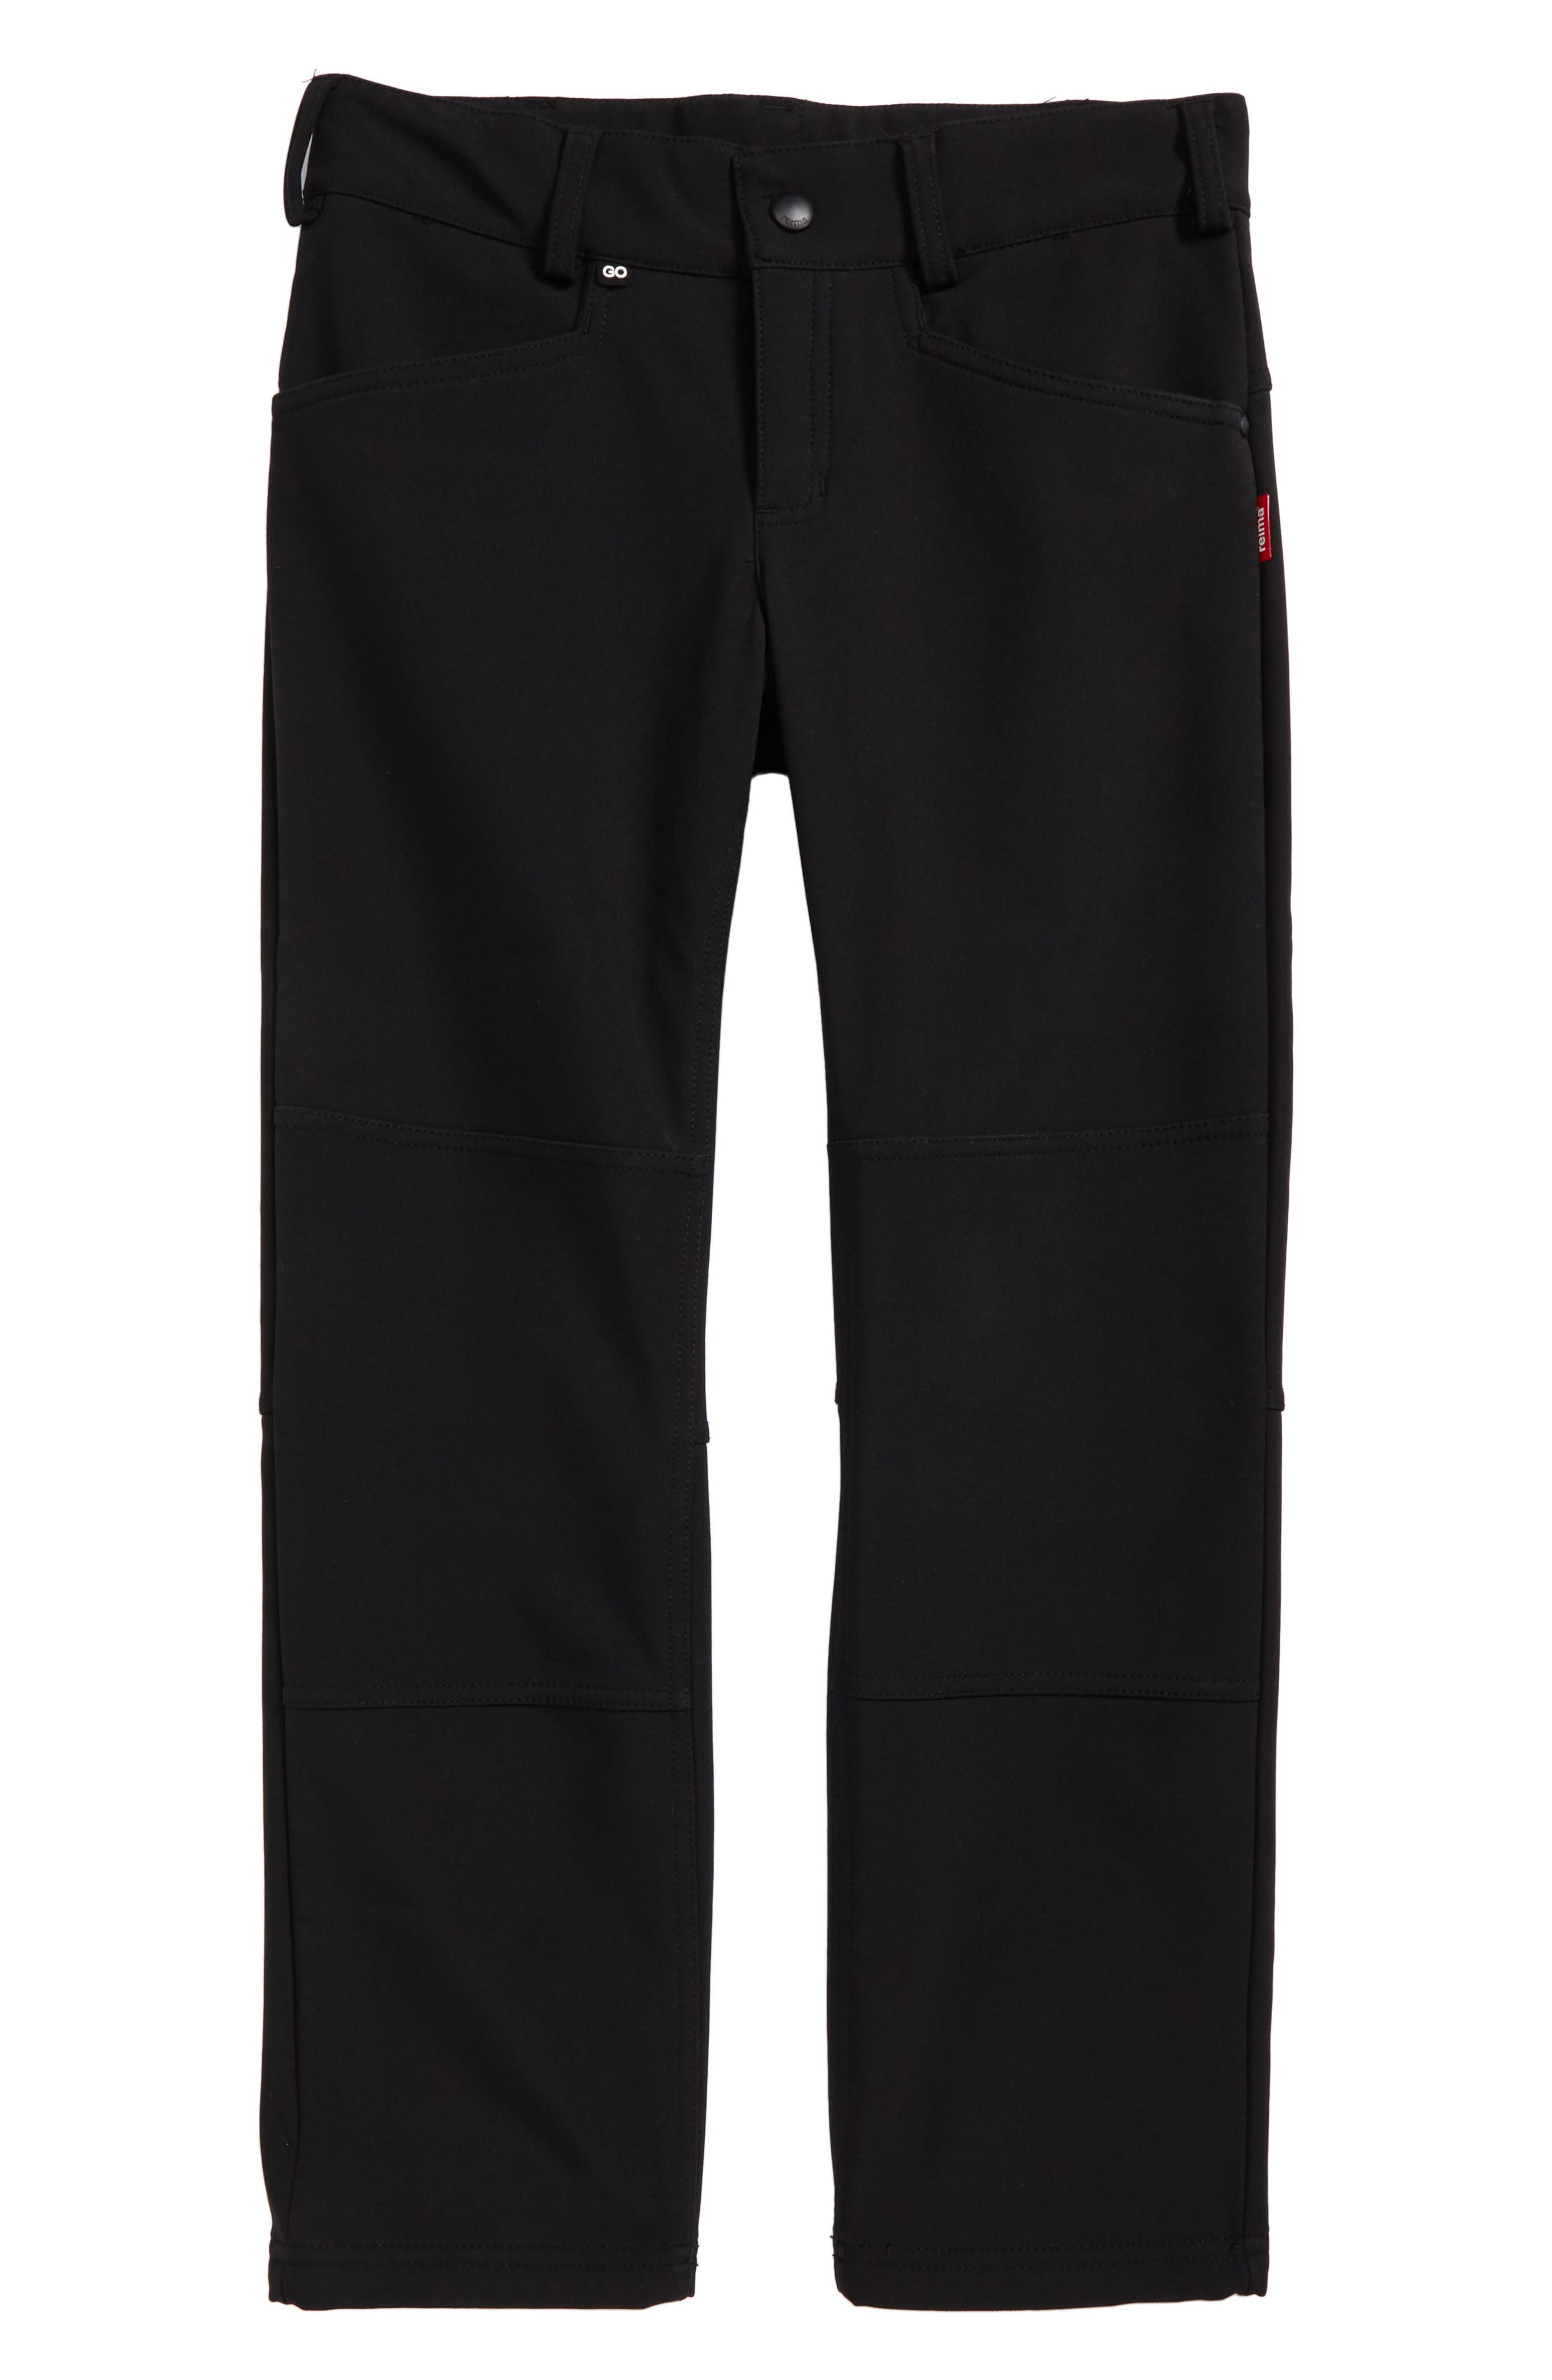 Mighty Softshell Pants,                         Main,                         color, Black